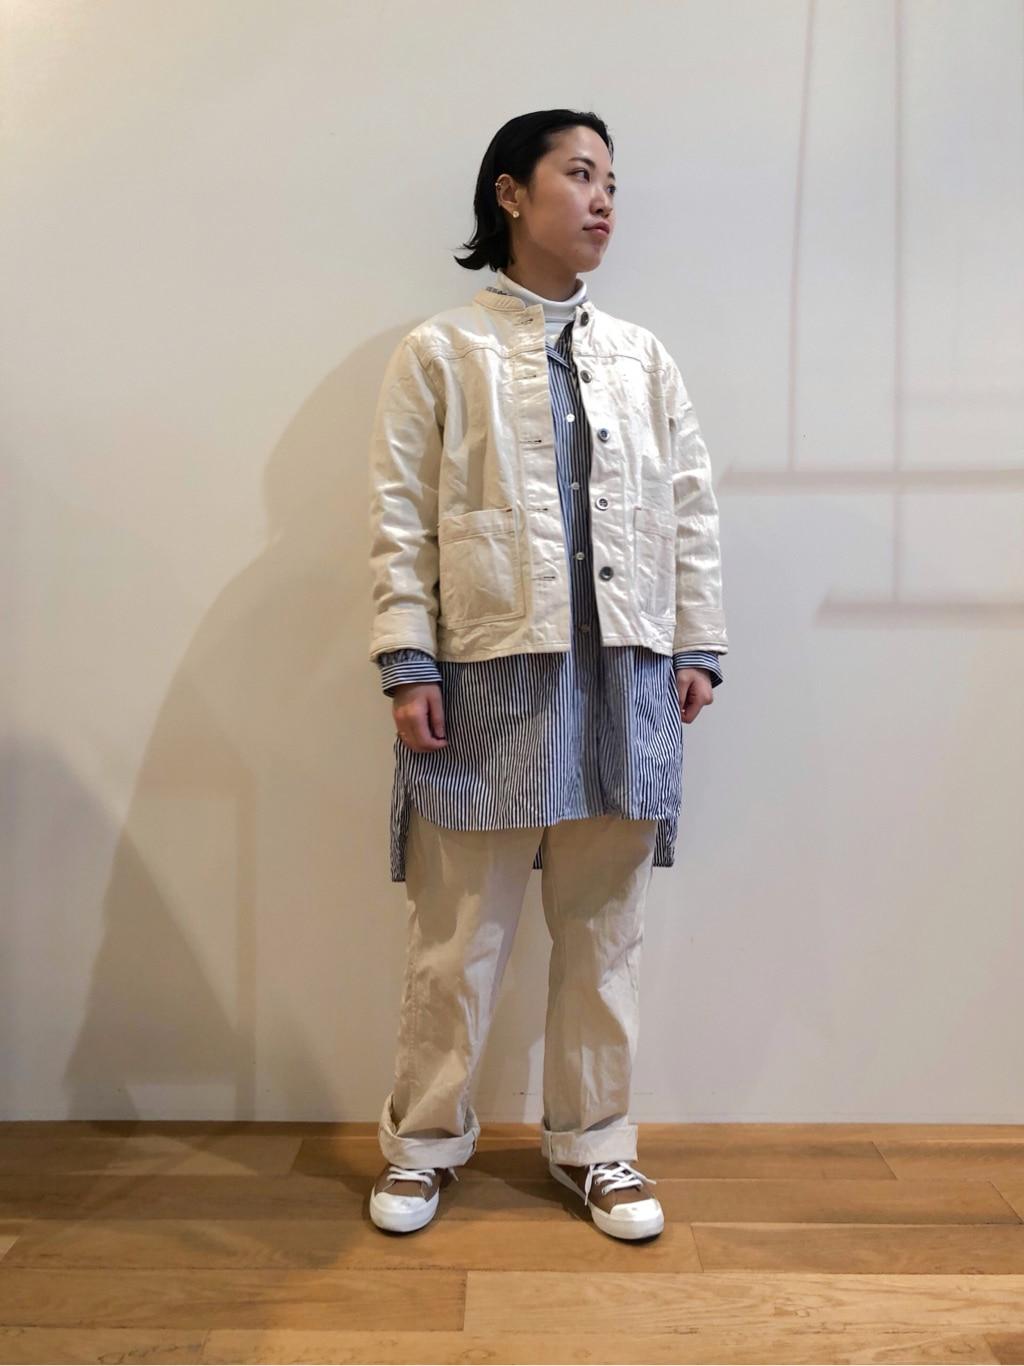 bulle de savon KITTE丸の内 身長:156cm 2020.12.28